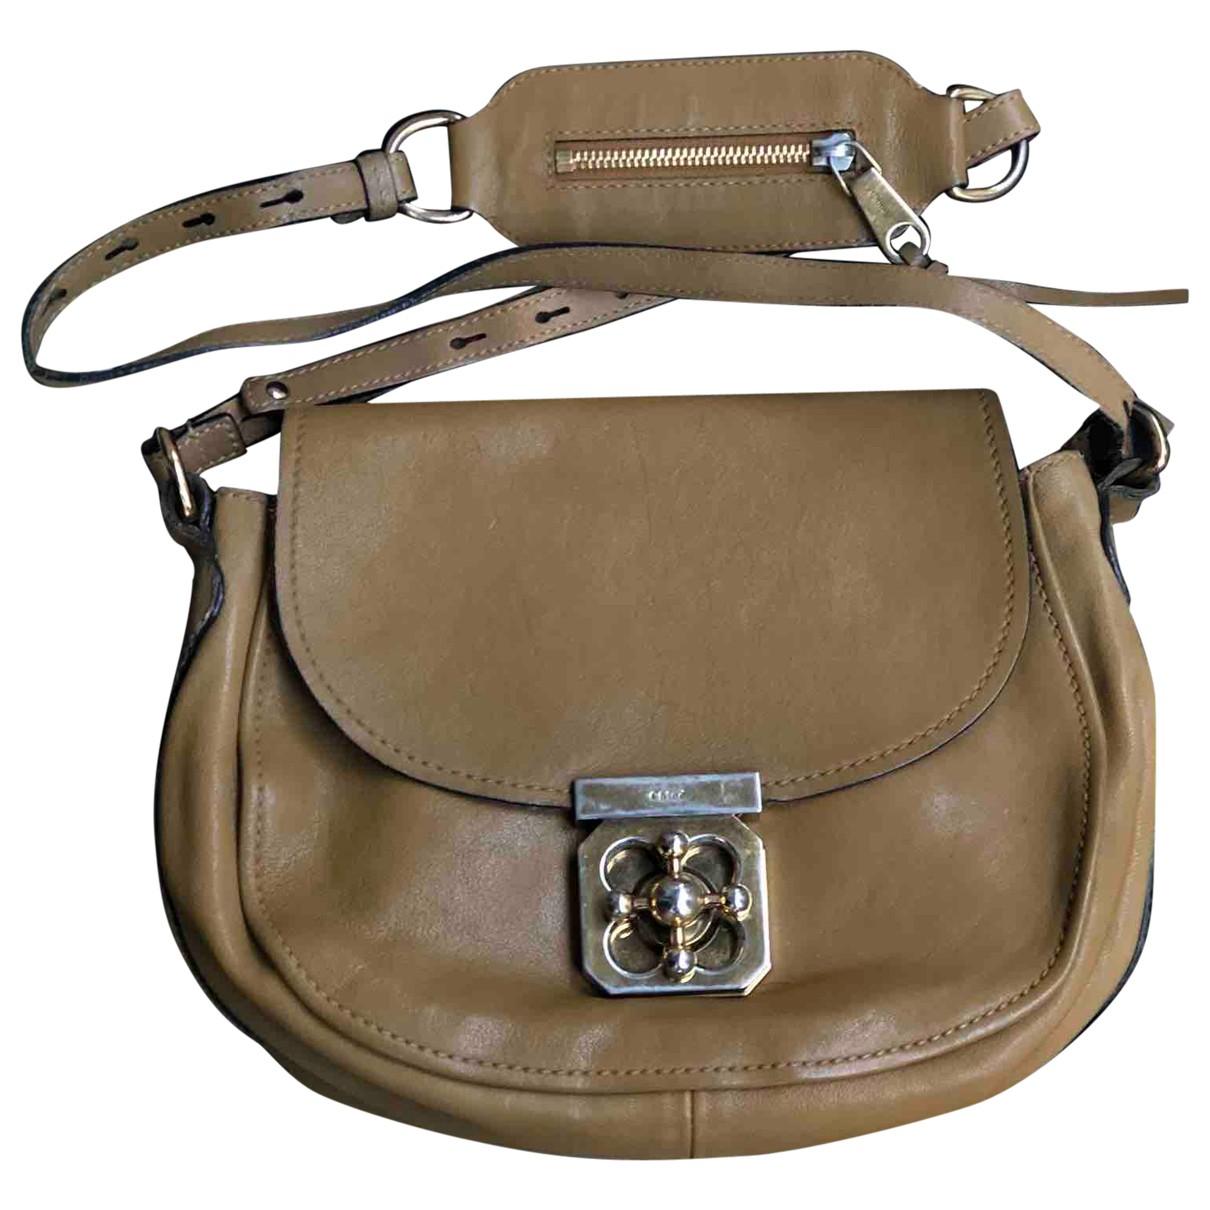 Chloé N Beige Leather handbag for Women N